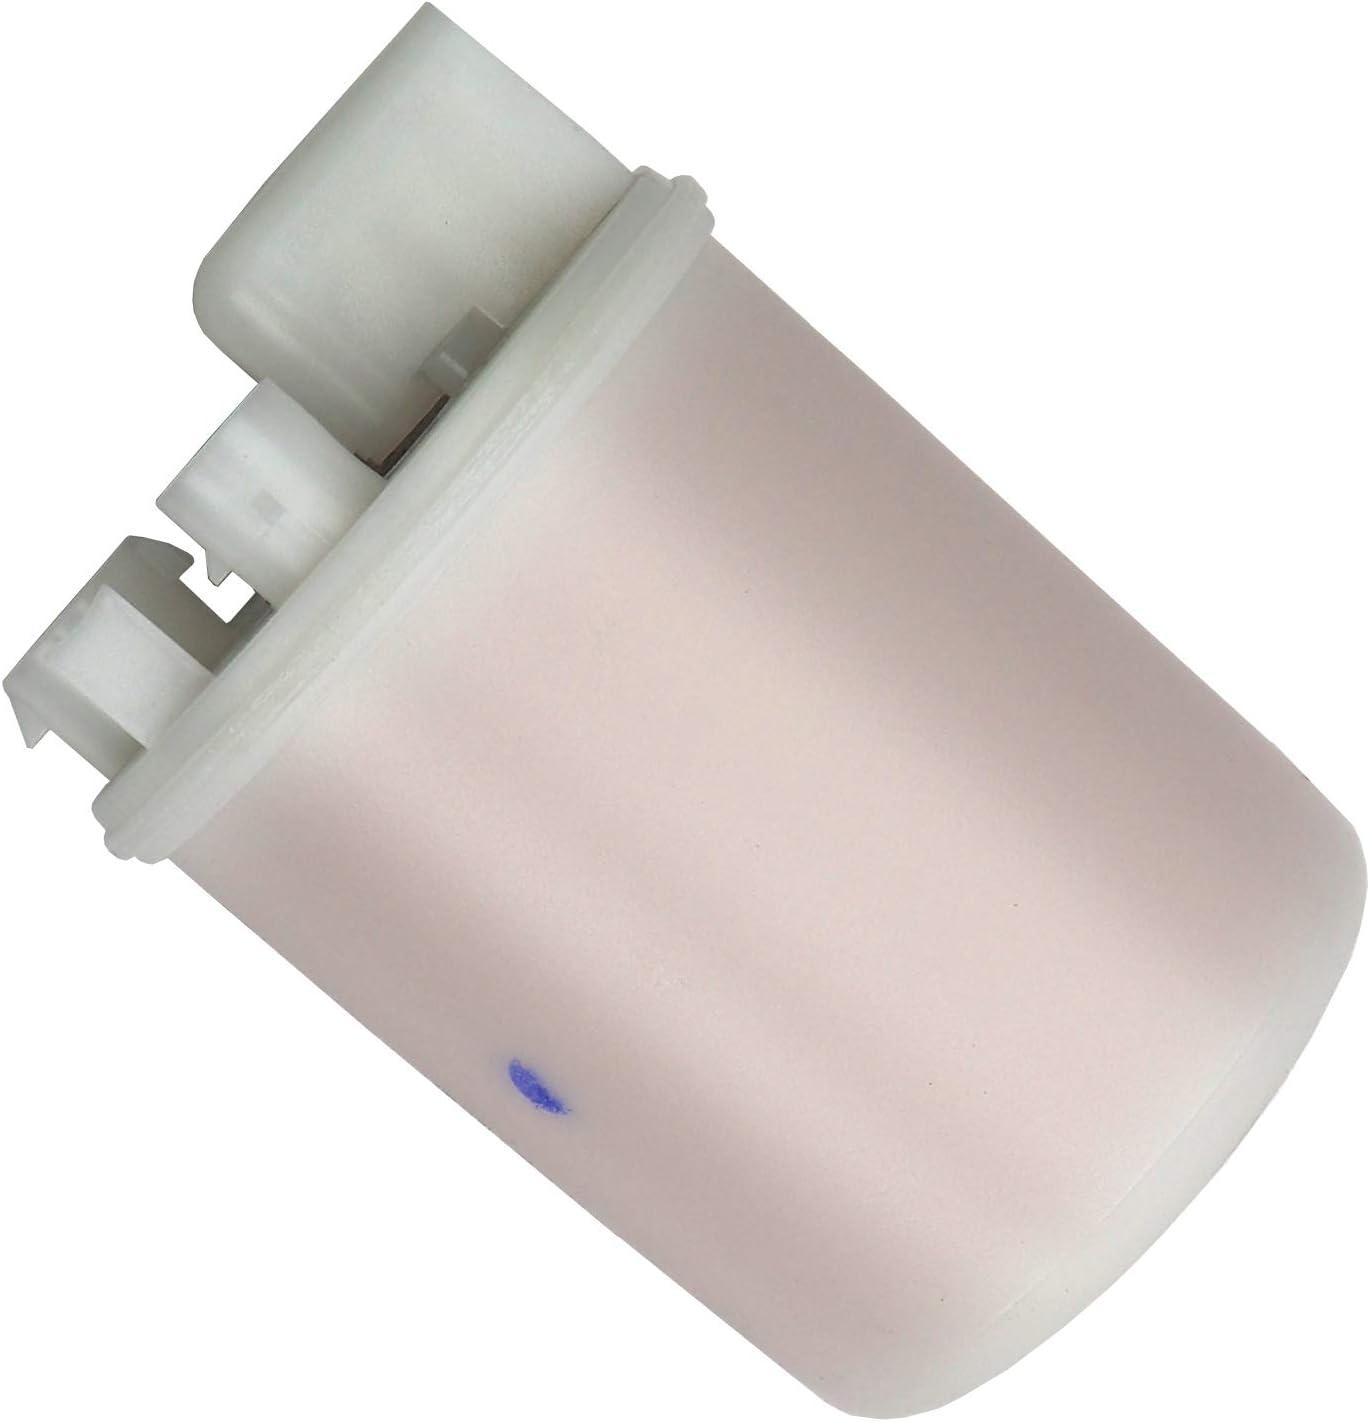 Beck Arnley 043-3017 Filter Max 53% OFF Albuquerque Mall Fuel